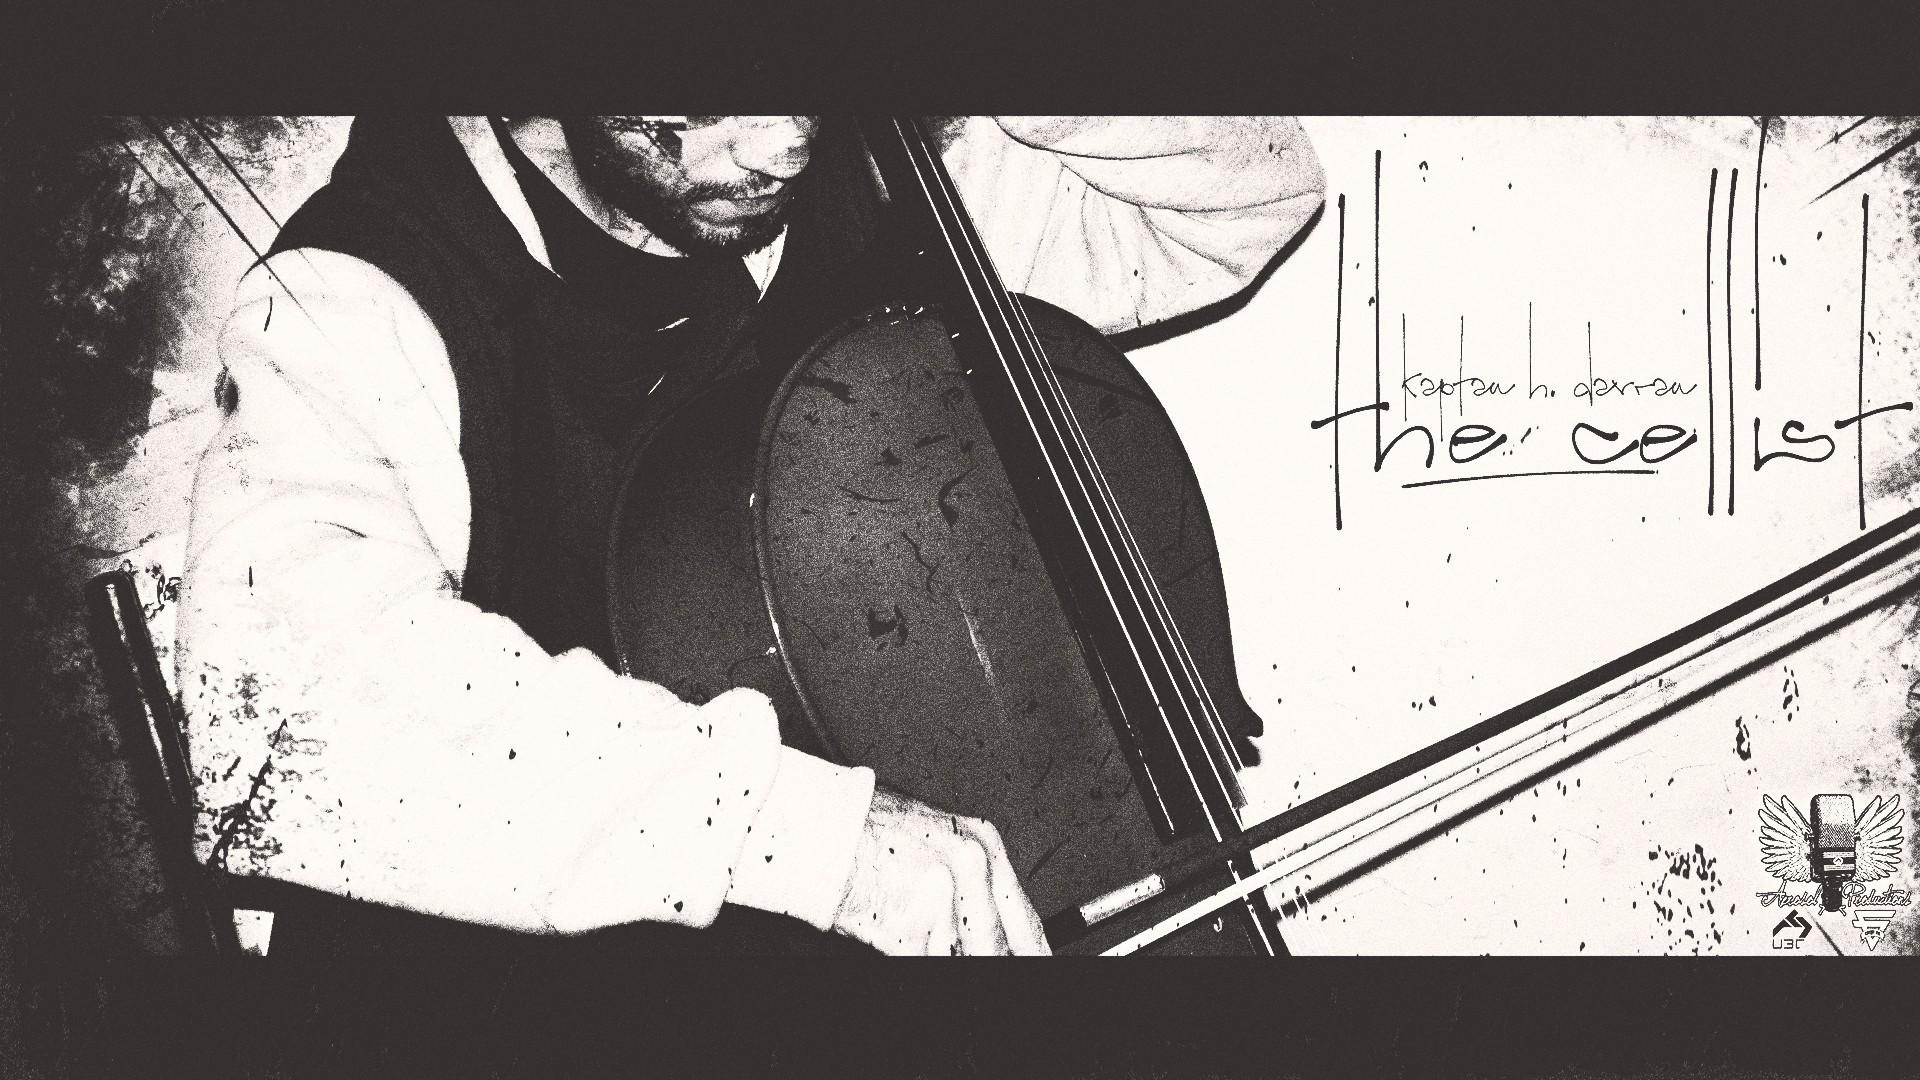 General 1920x1080 Kaptan H. Davran cello album covers the cellist Aerosol Productions monochrome